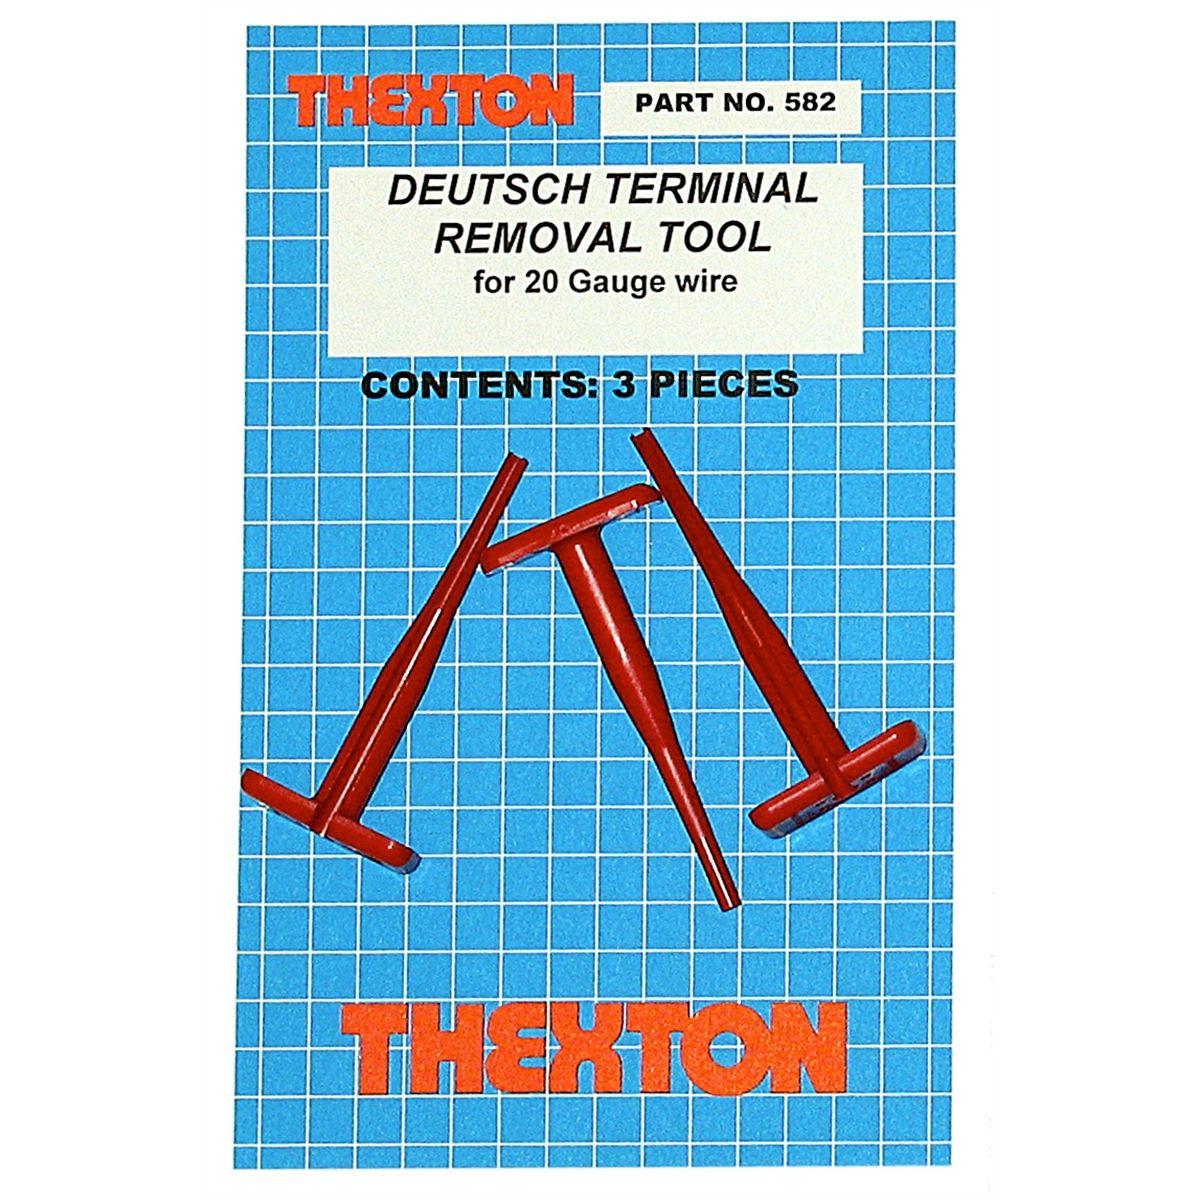 Deutsch Terminal Release Tool for 20 Gauge Wire | Thexton Mfg Co | 582